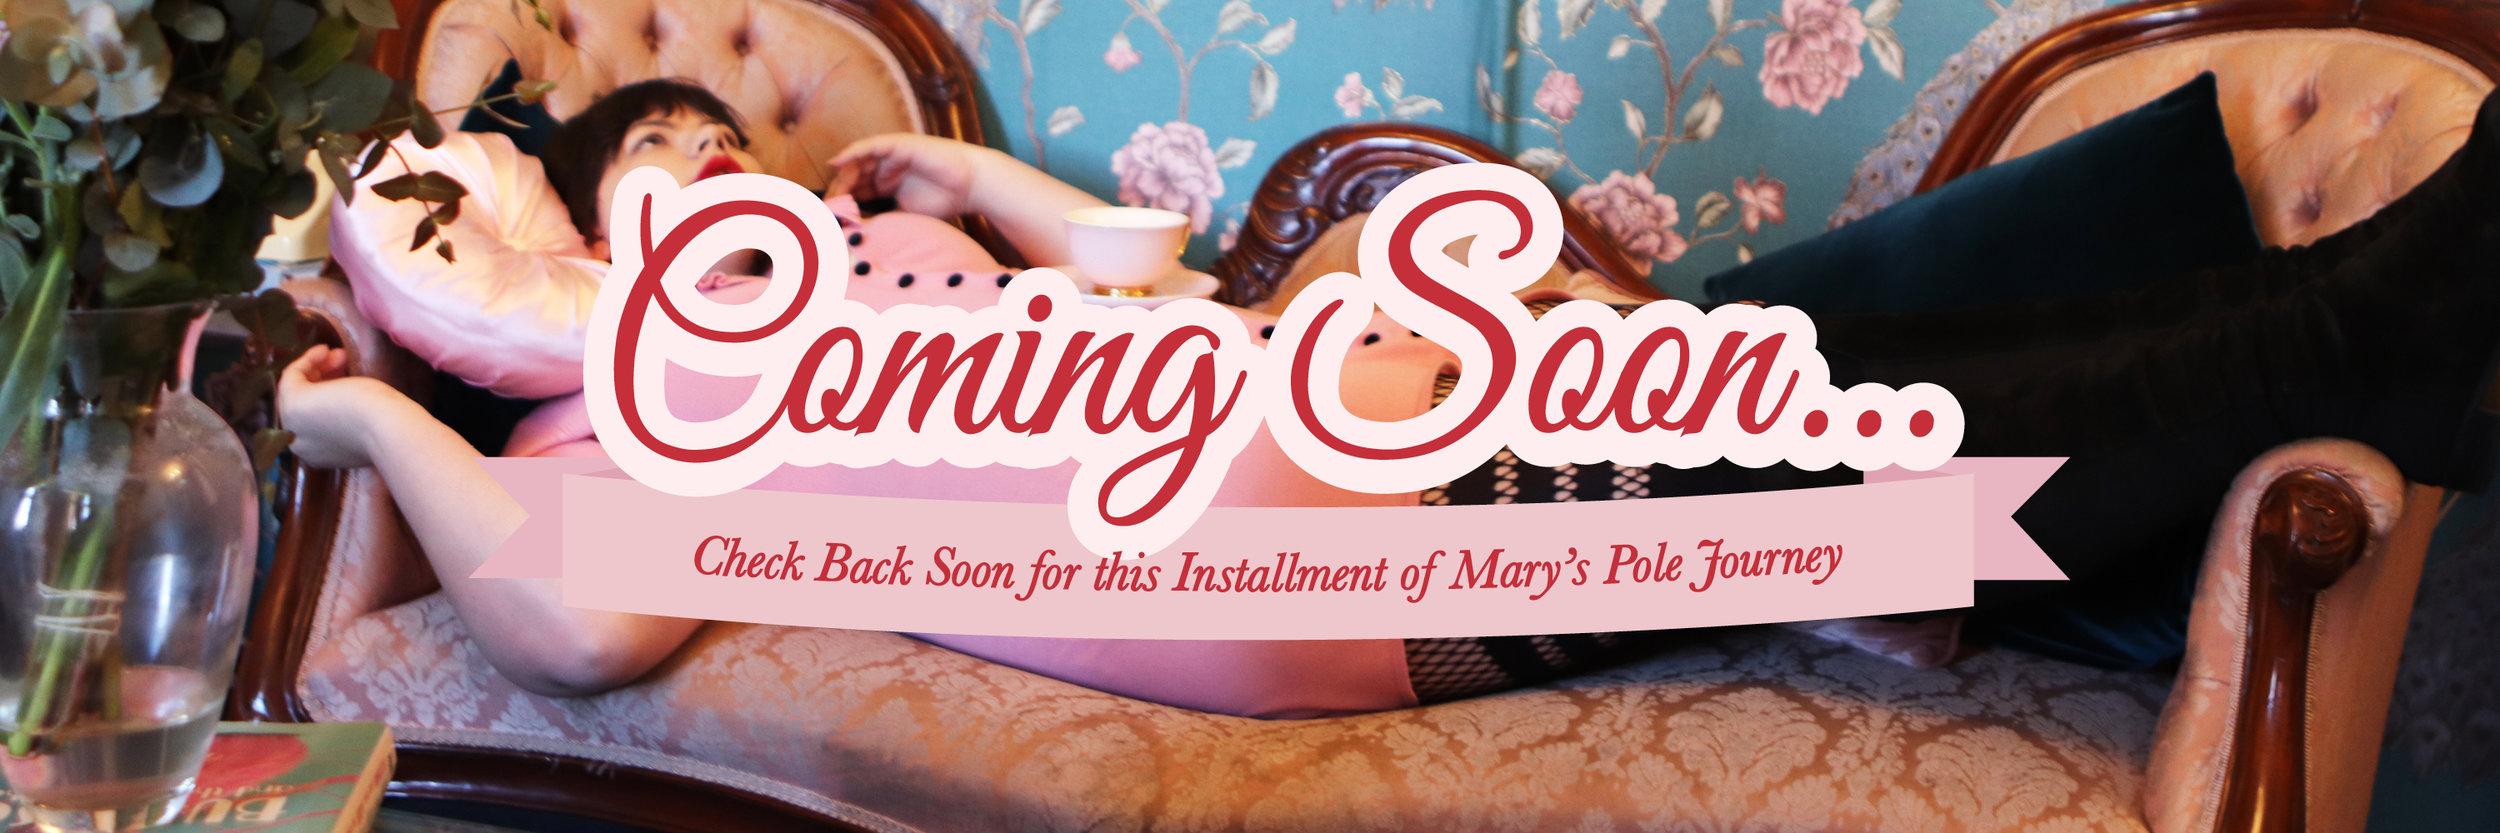 mary-coming-soon.jpg